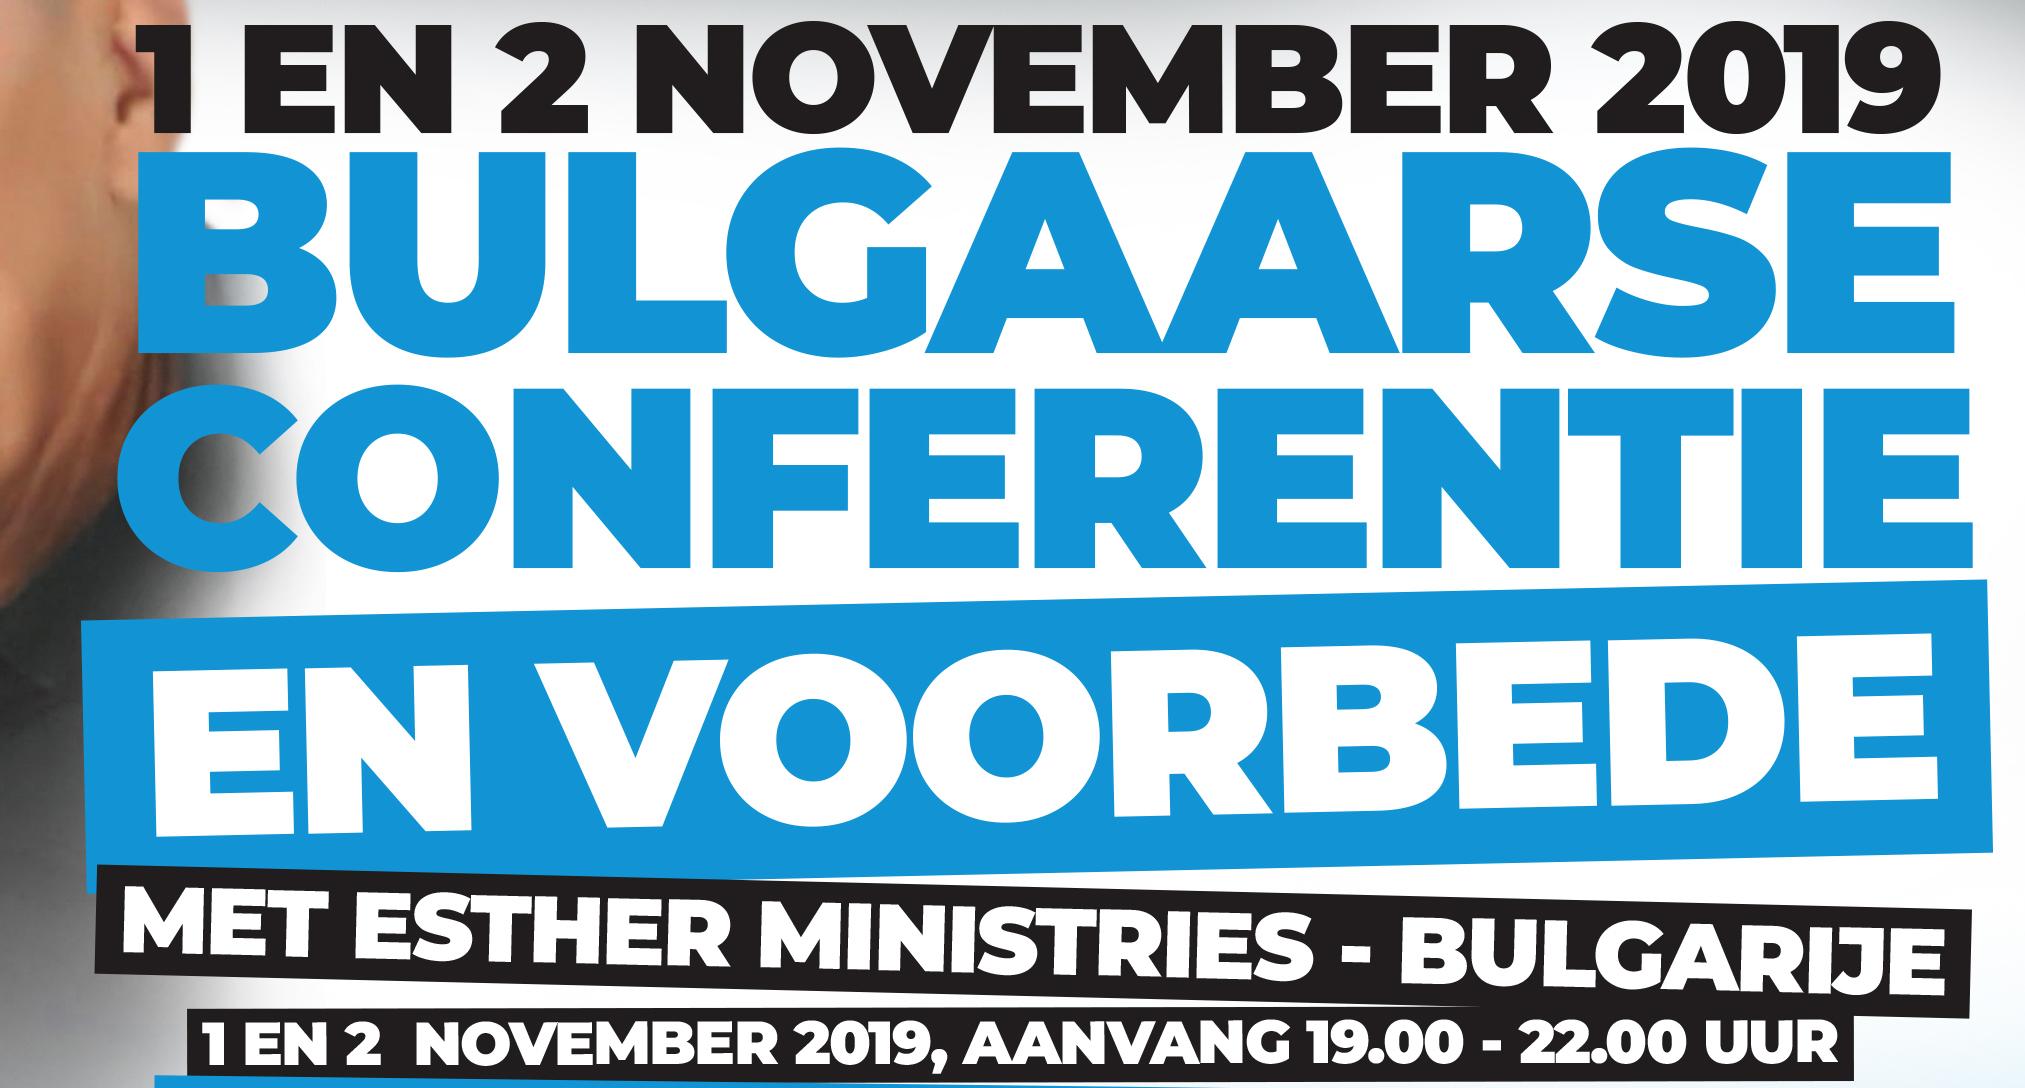 Bulgaarse conferentie